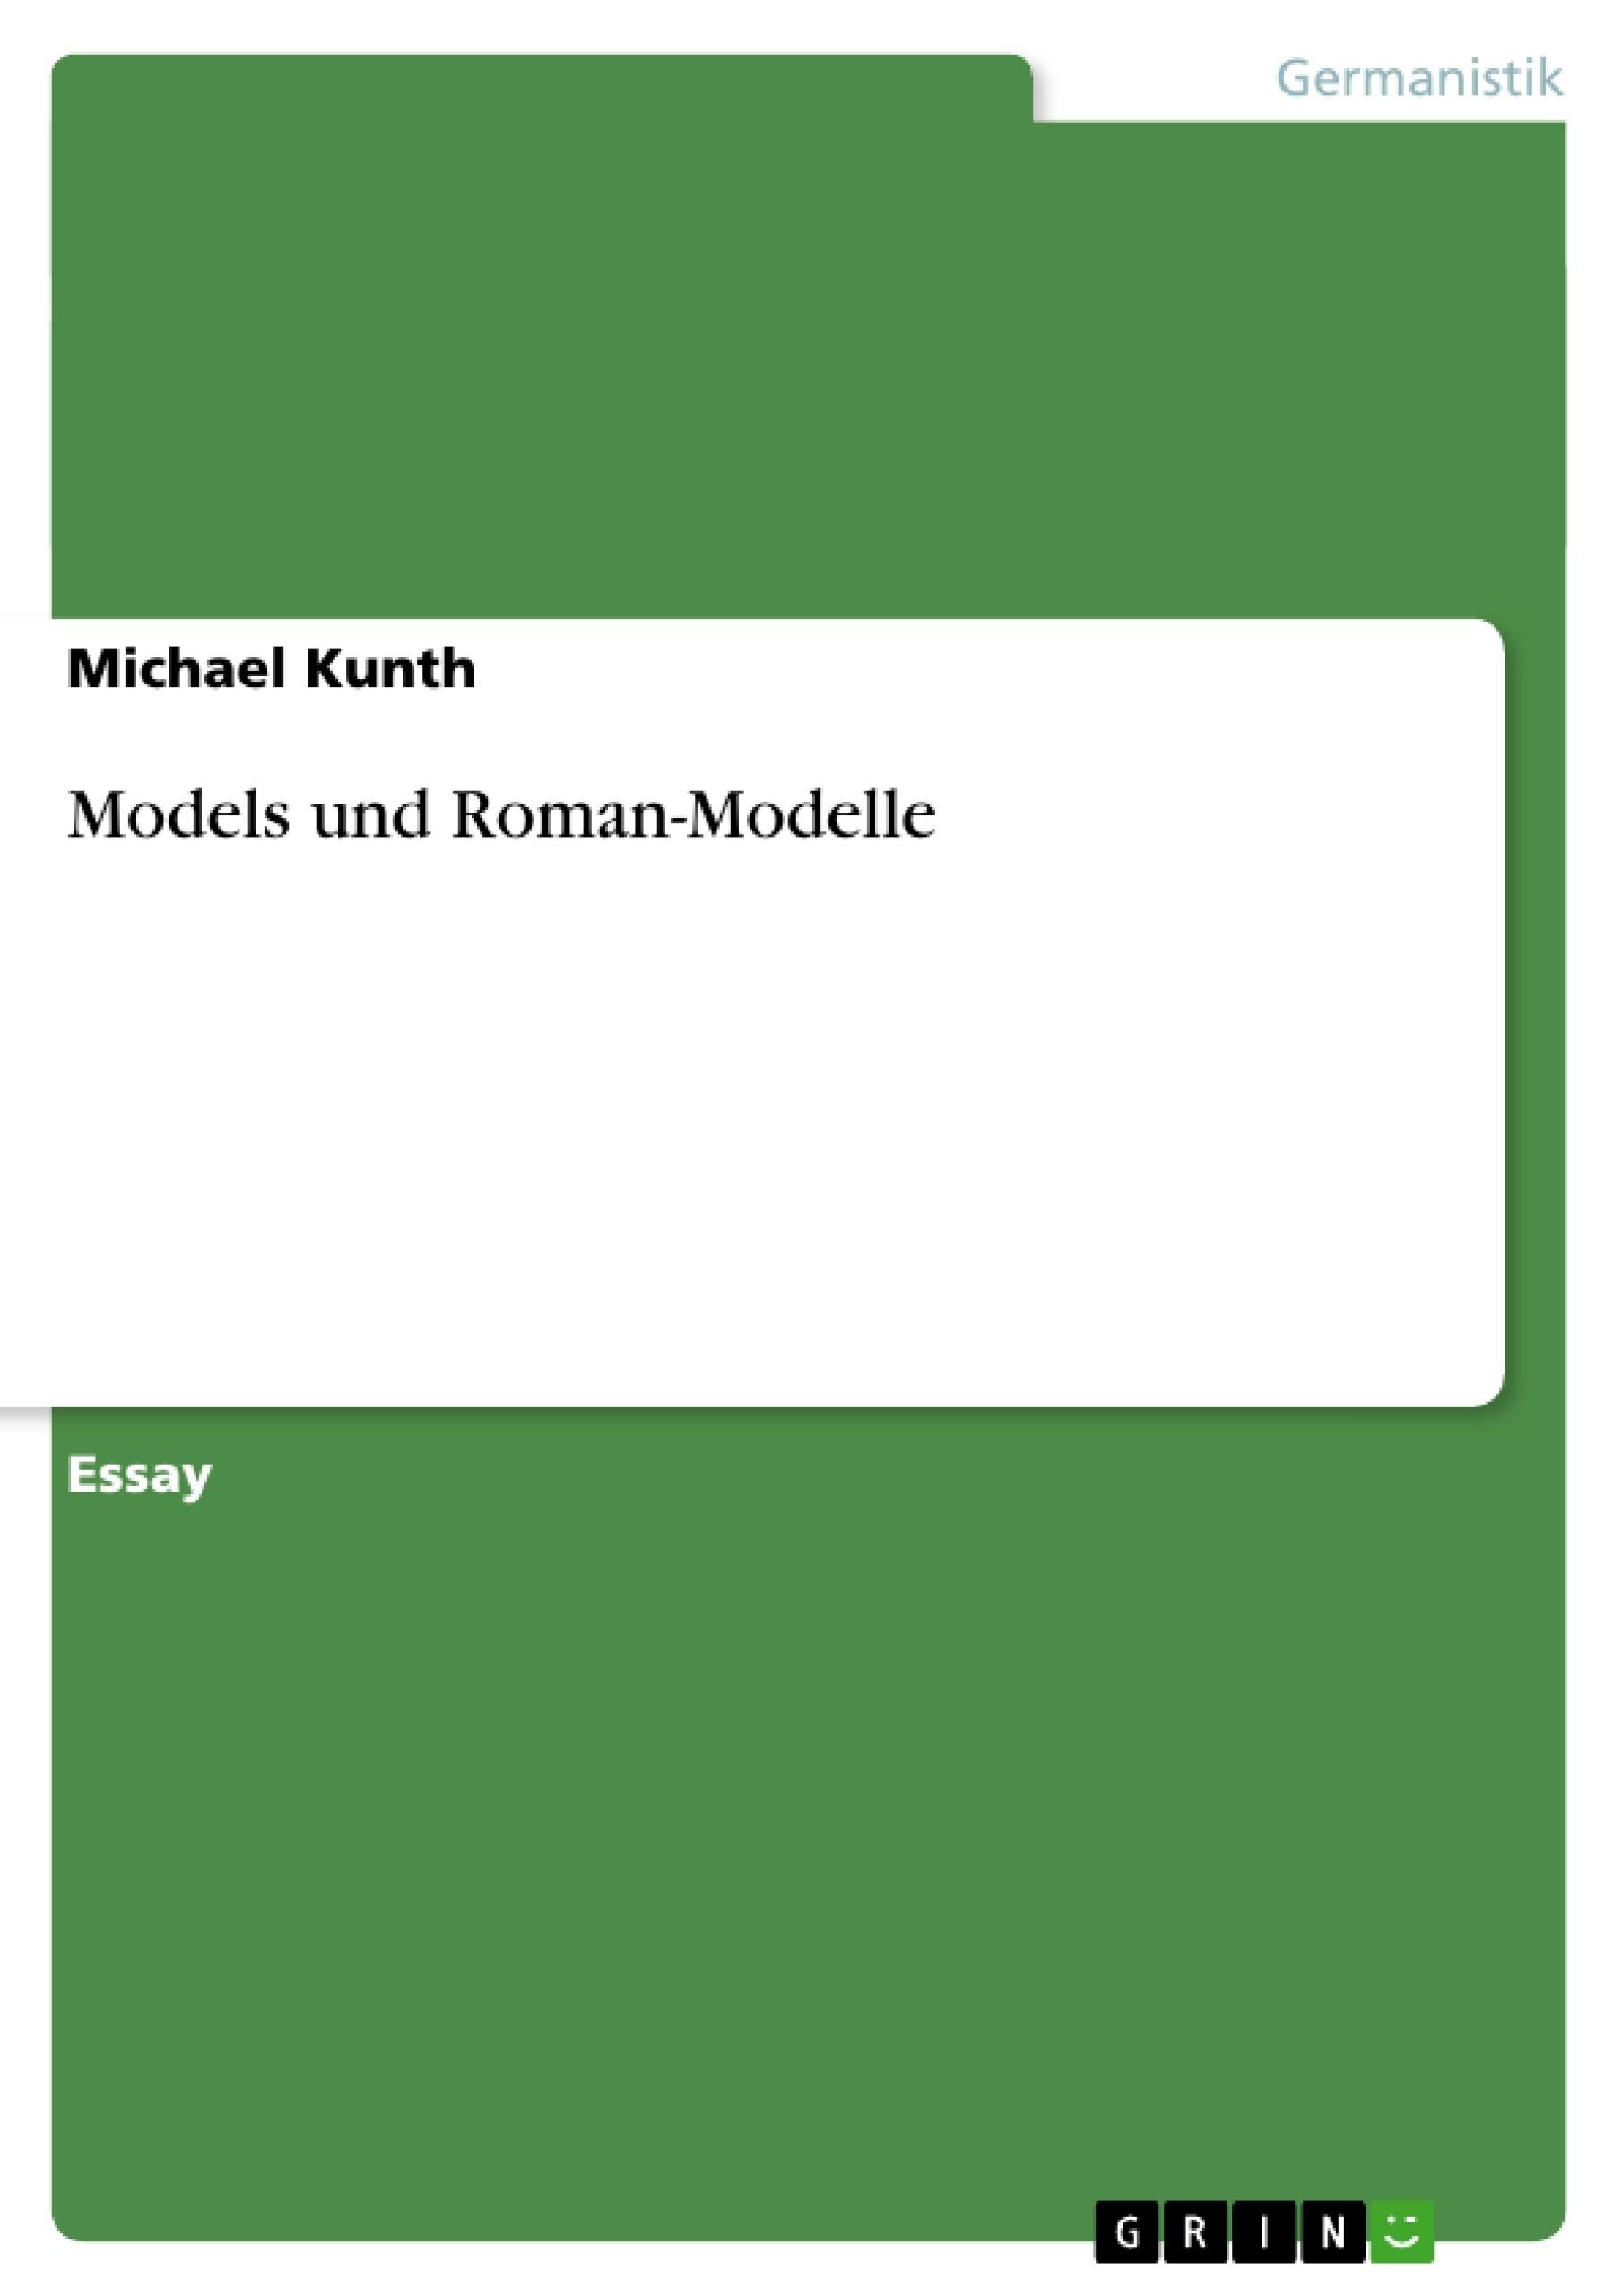 Titel: Models und Roman-Modelle